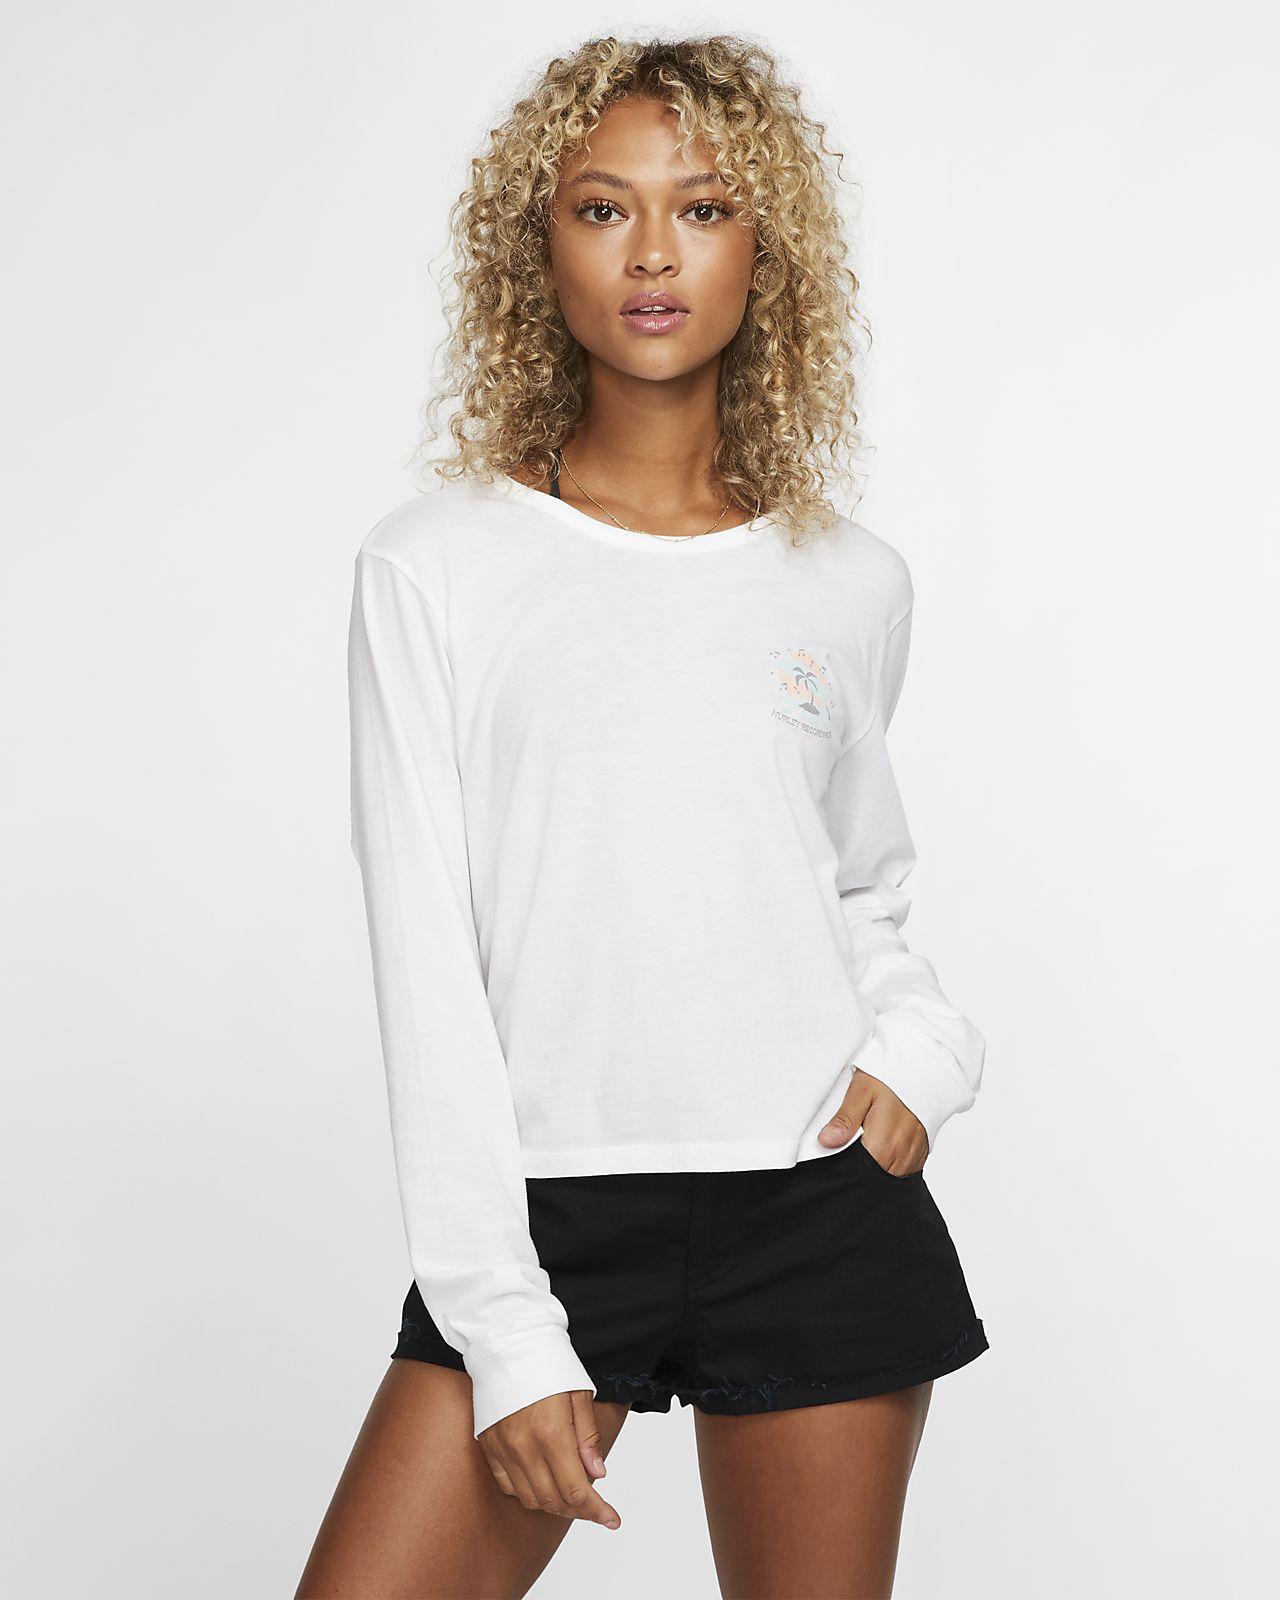 fantastic savings super cheap great deals 2017 Hurley Record Palms Perfect Women's Long-Sleeve T-Shirt